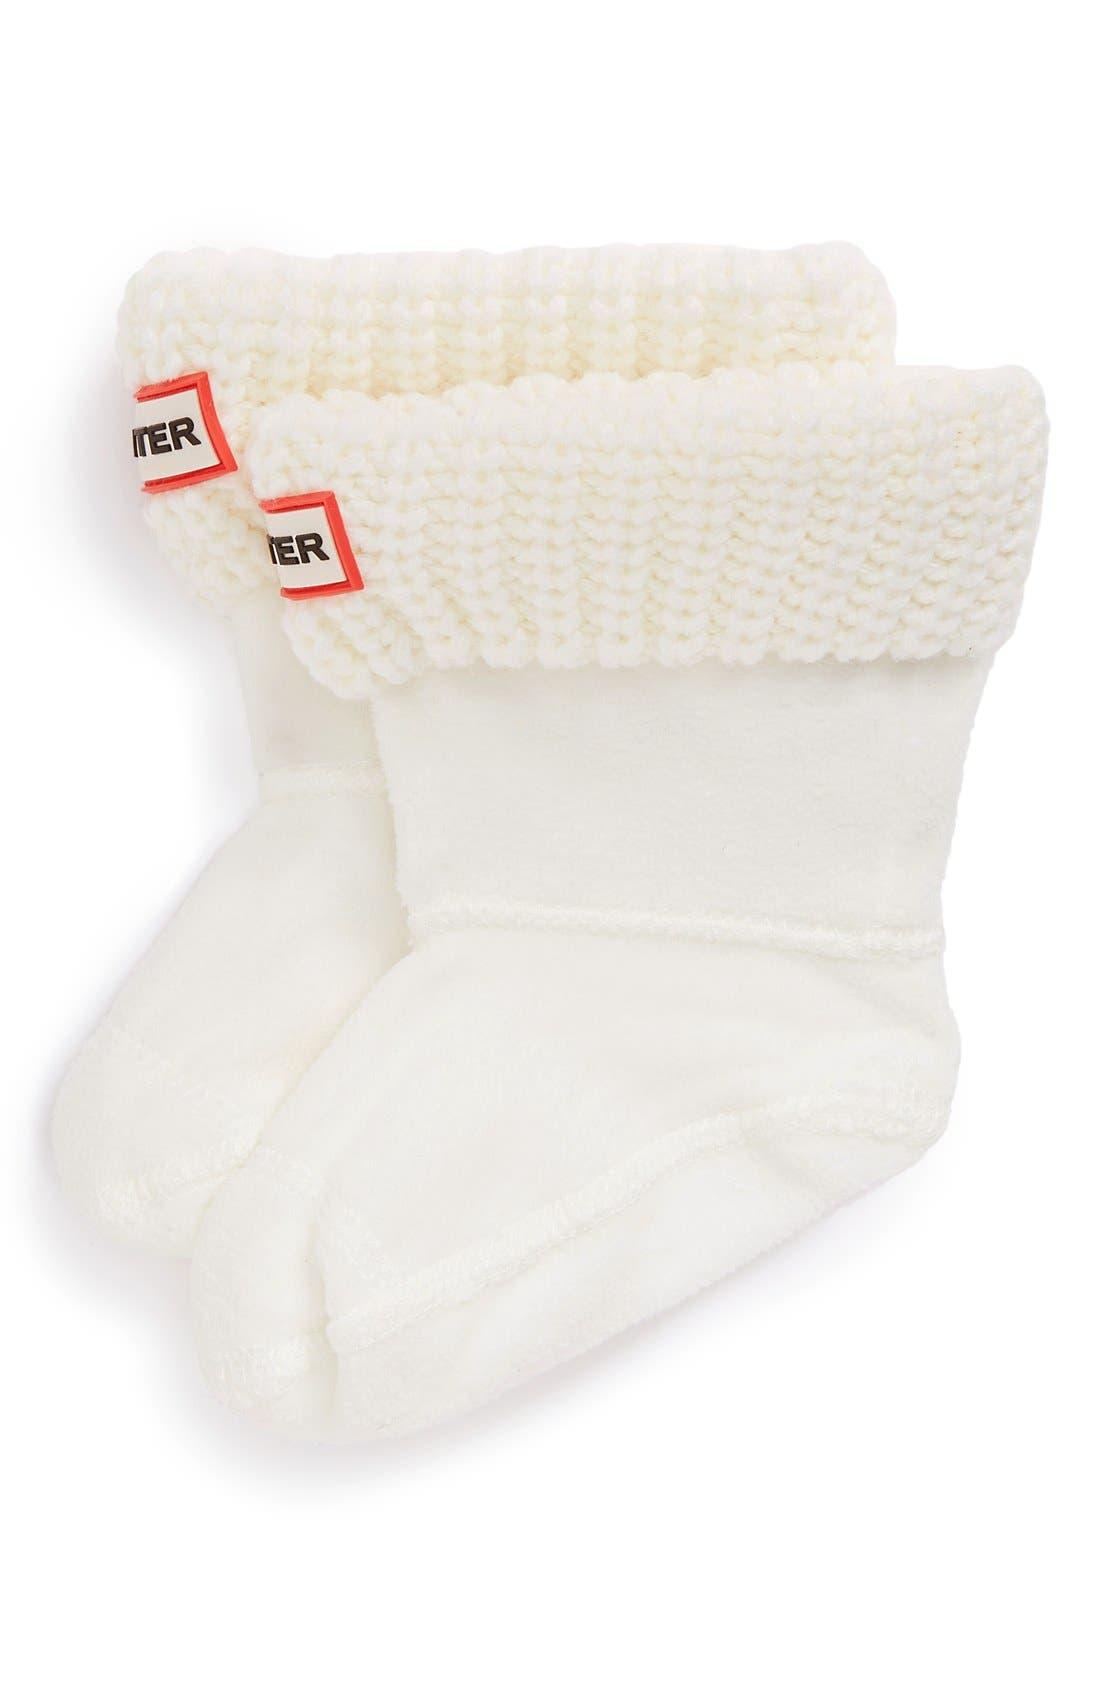 Toddler Girls Hunter Cardigan Knit Cuff Welly Boot Socks Size 810  White